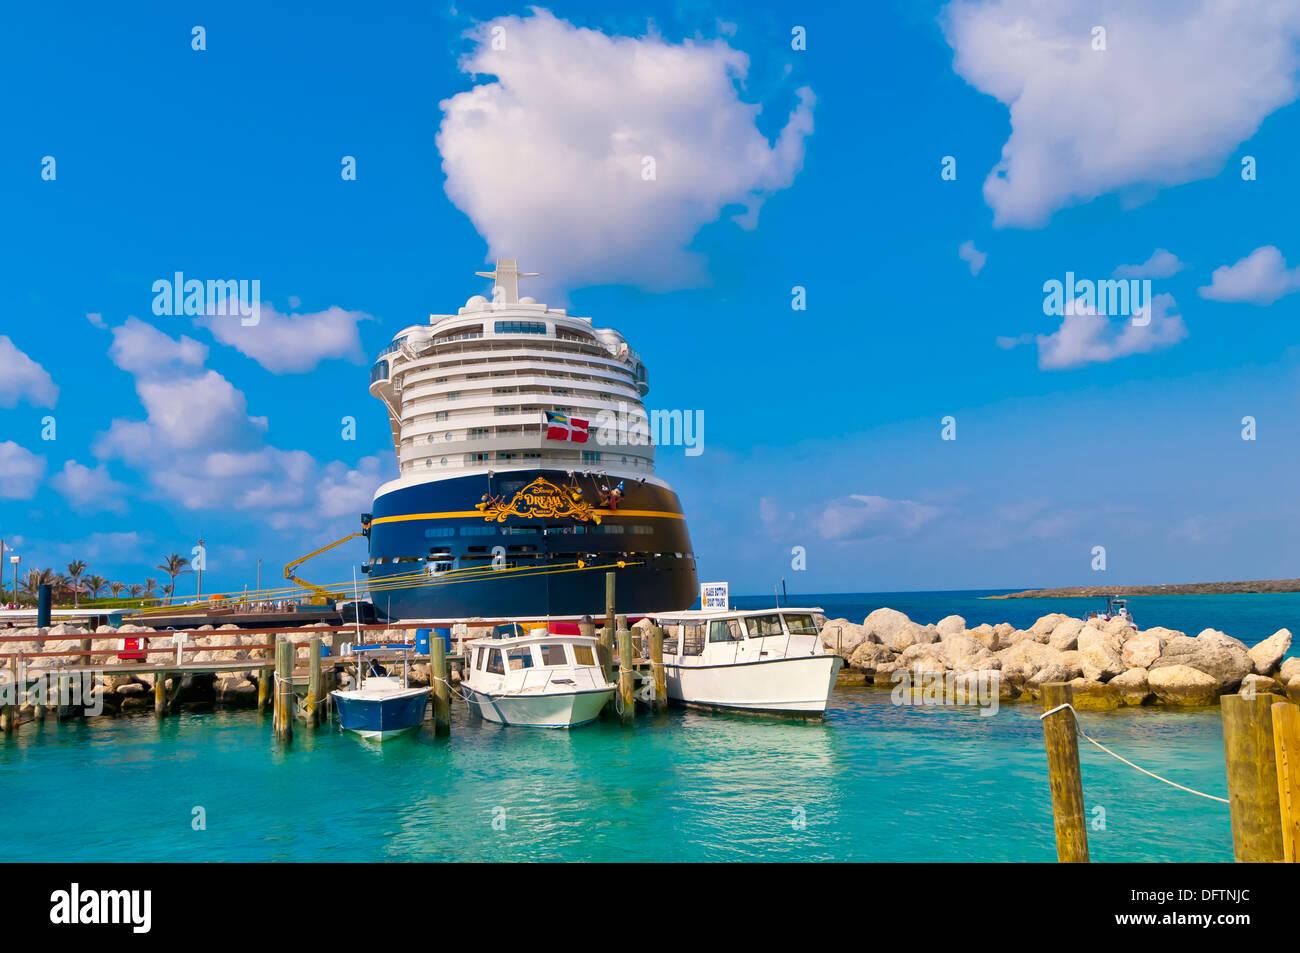 Disney Dream Cruise Schiff Angedockt An Privaten Insel Castaway Cay Disneyfigur The Bahamas Stockfotografie Alamy